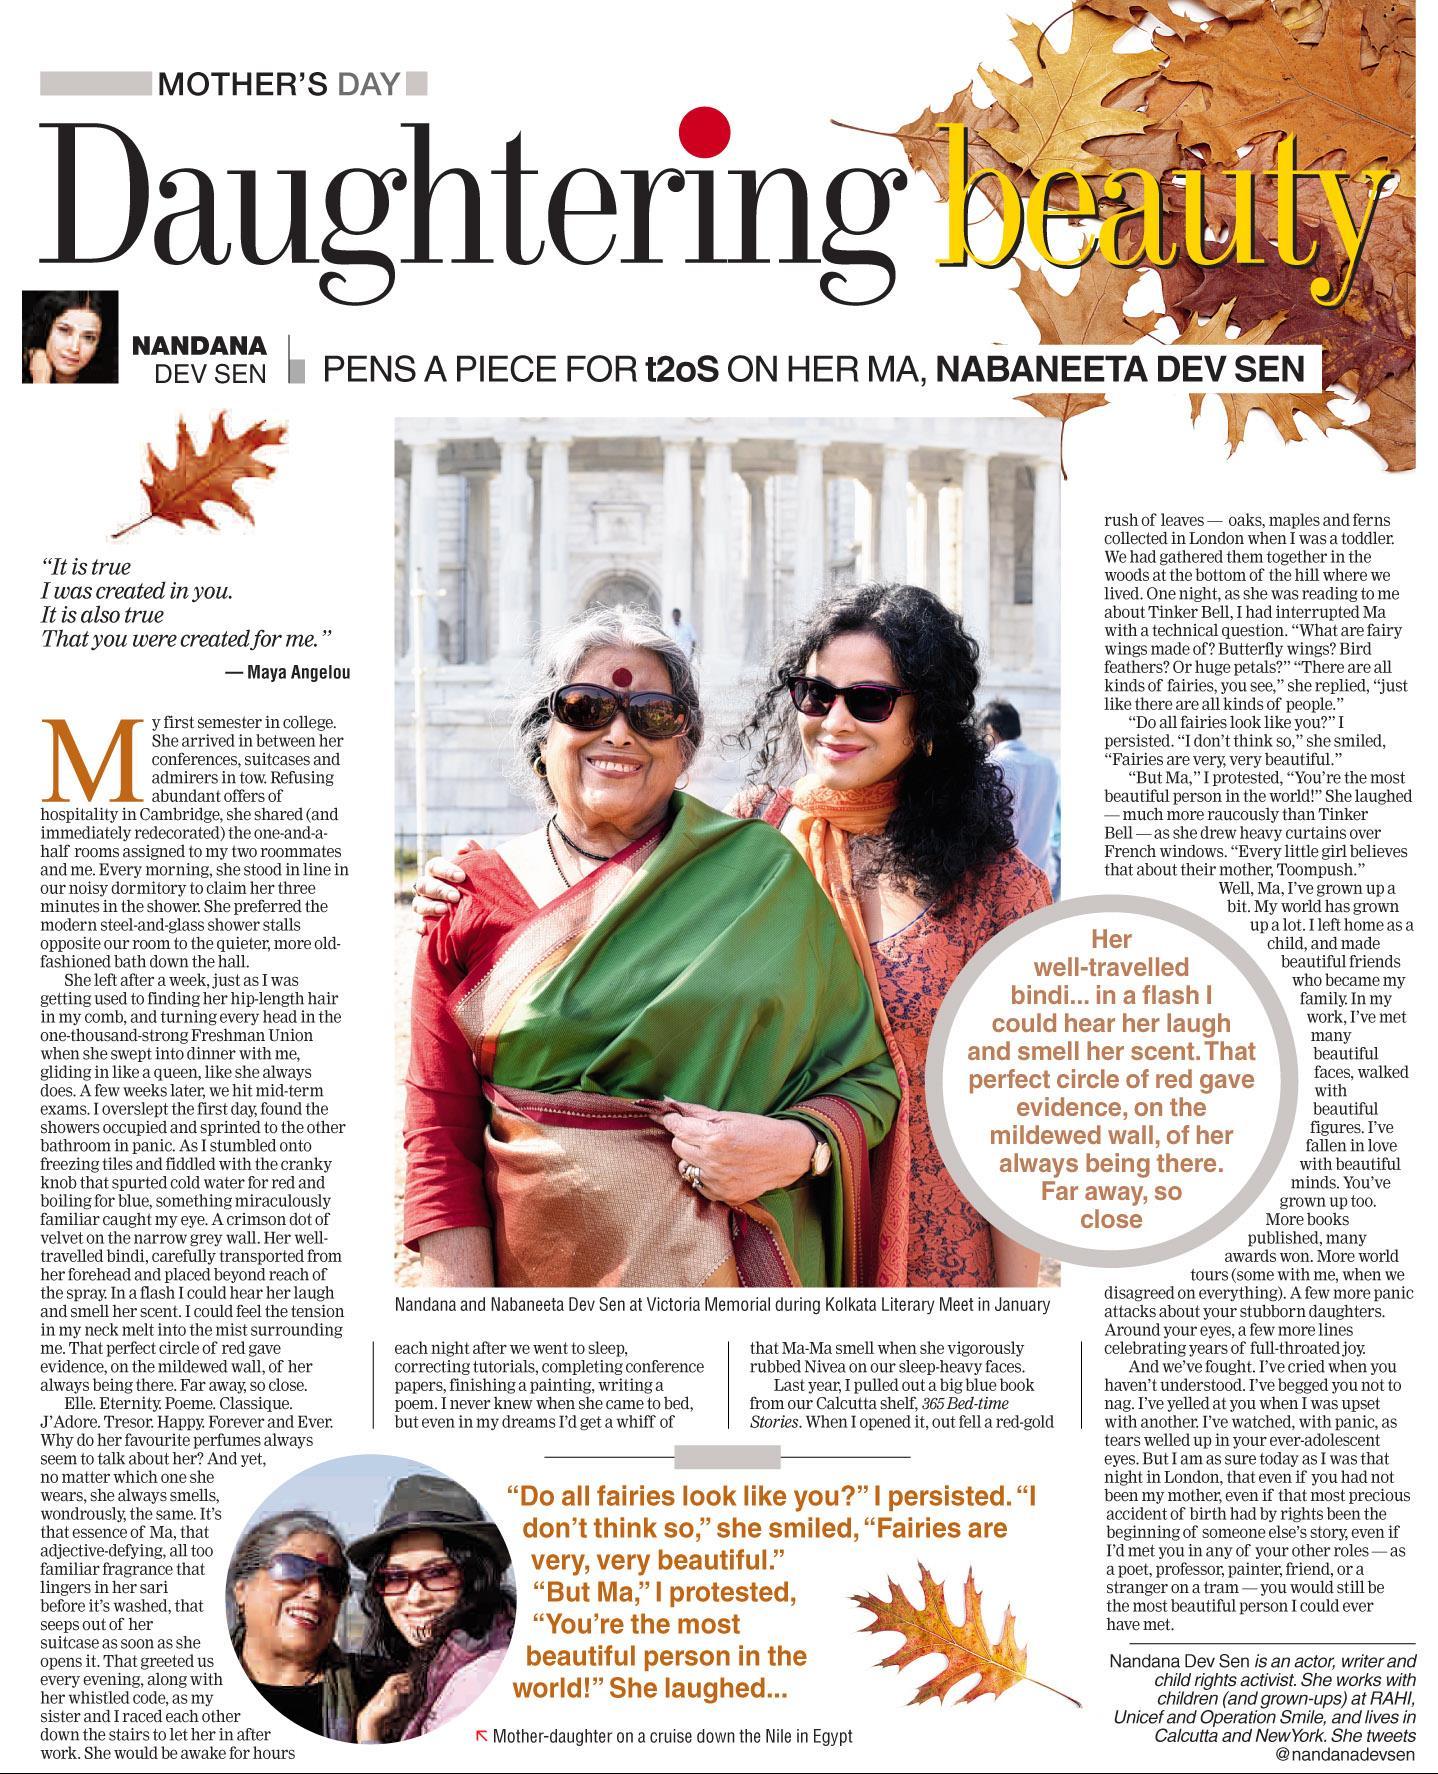 https://epaper.telegraphindia.com/paper/6-24-14@05@2017-1001.html   The Telegraph, May 14, 2017